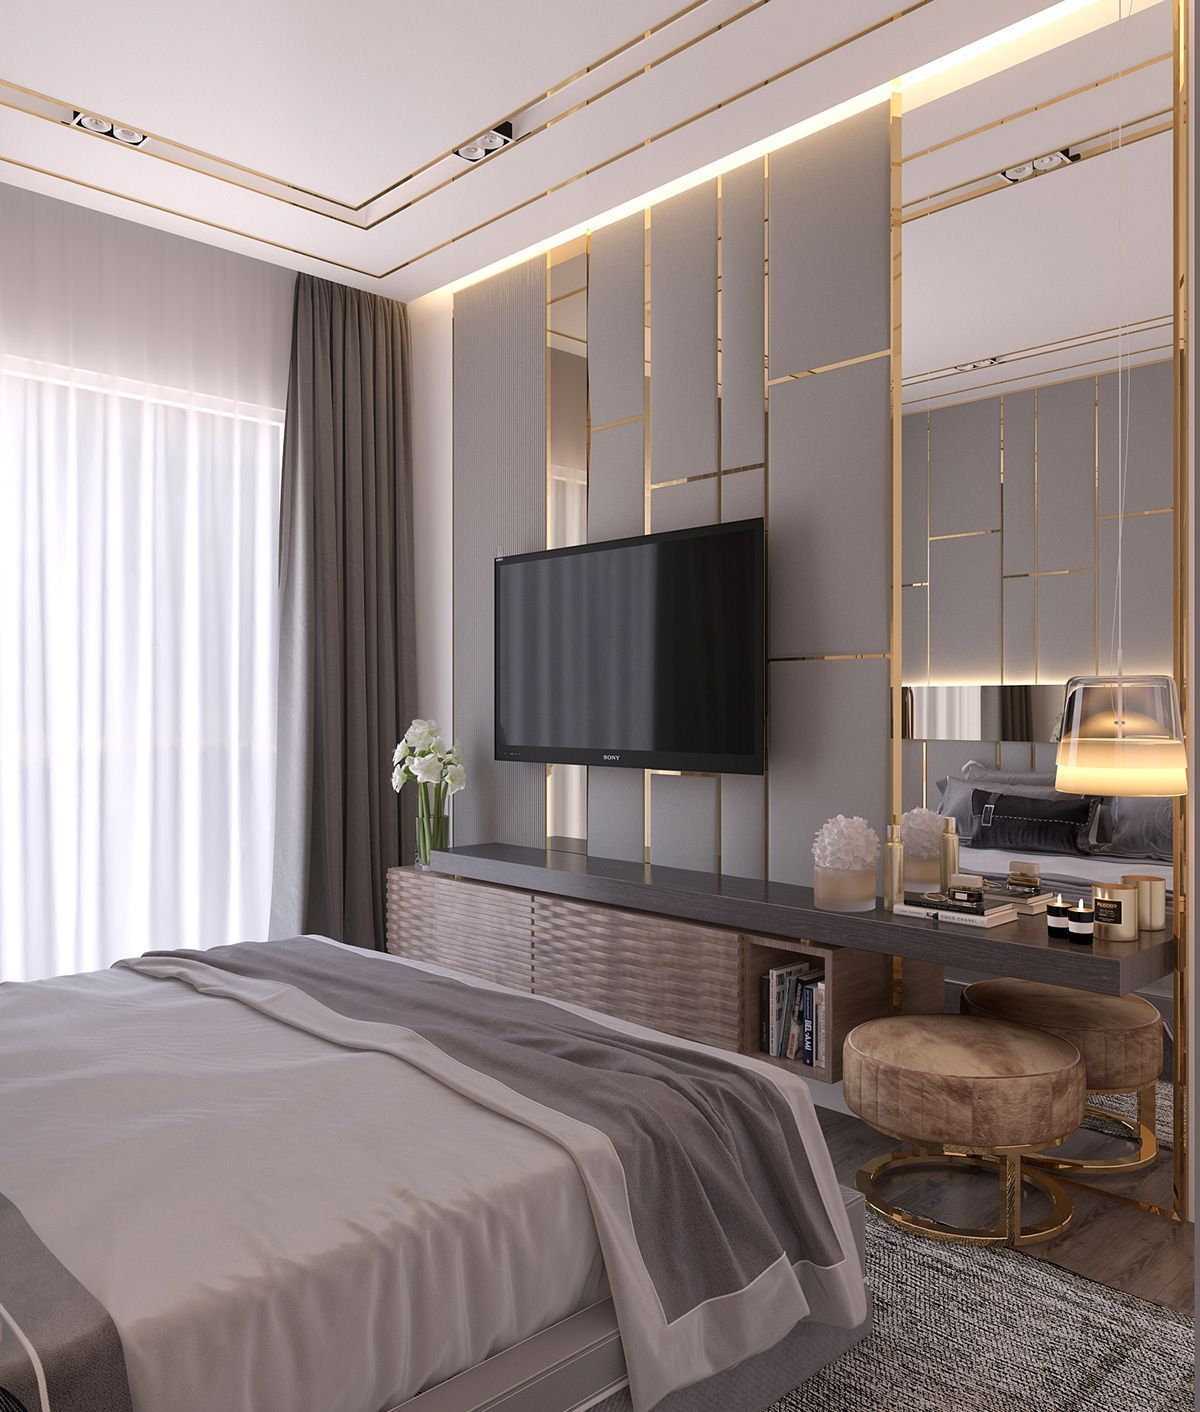 Photo of 11 Clever Designs of How to Make Bedroom Modern Design #bedroomdesign 11 Clever …